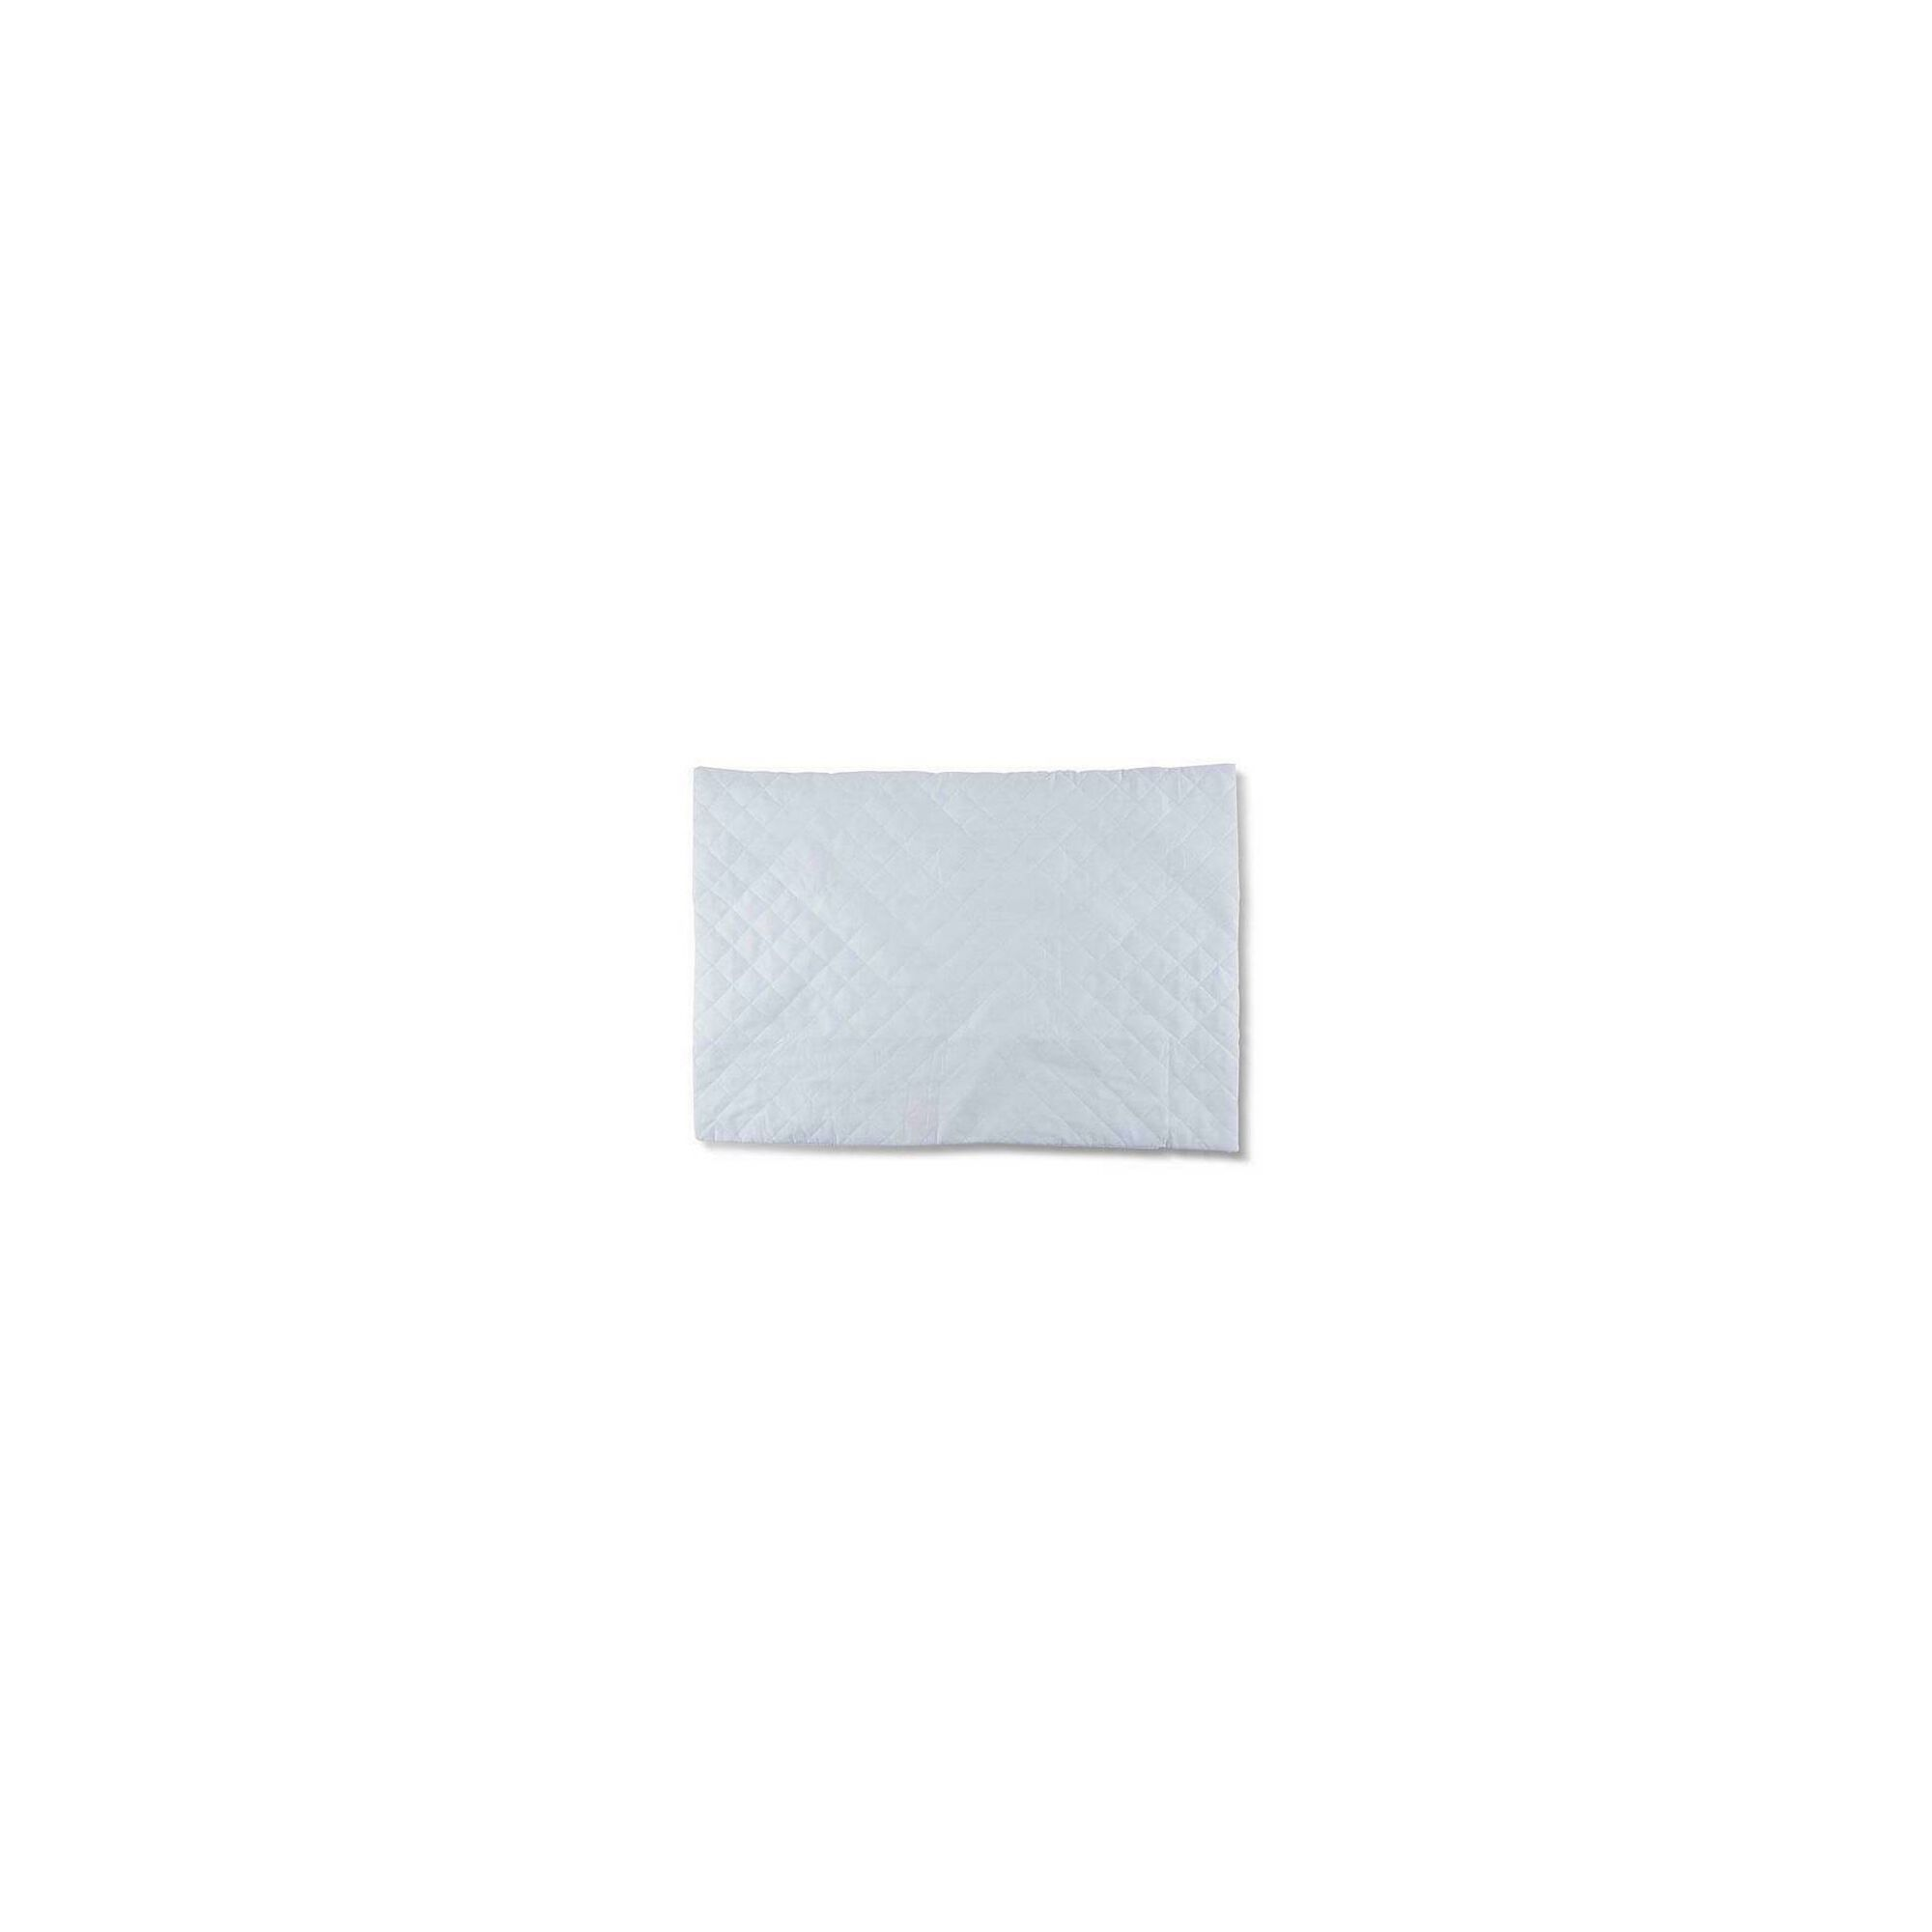 Protetor Almofada Acolchoado 50x70cm Branco